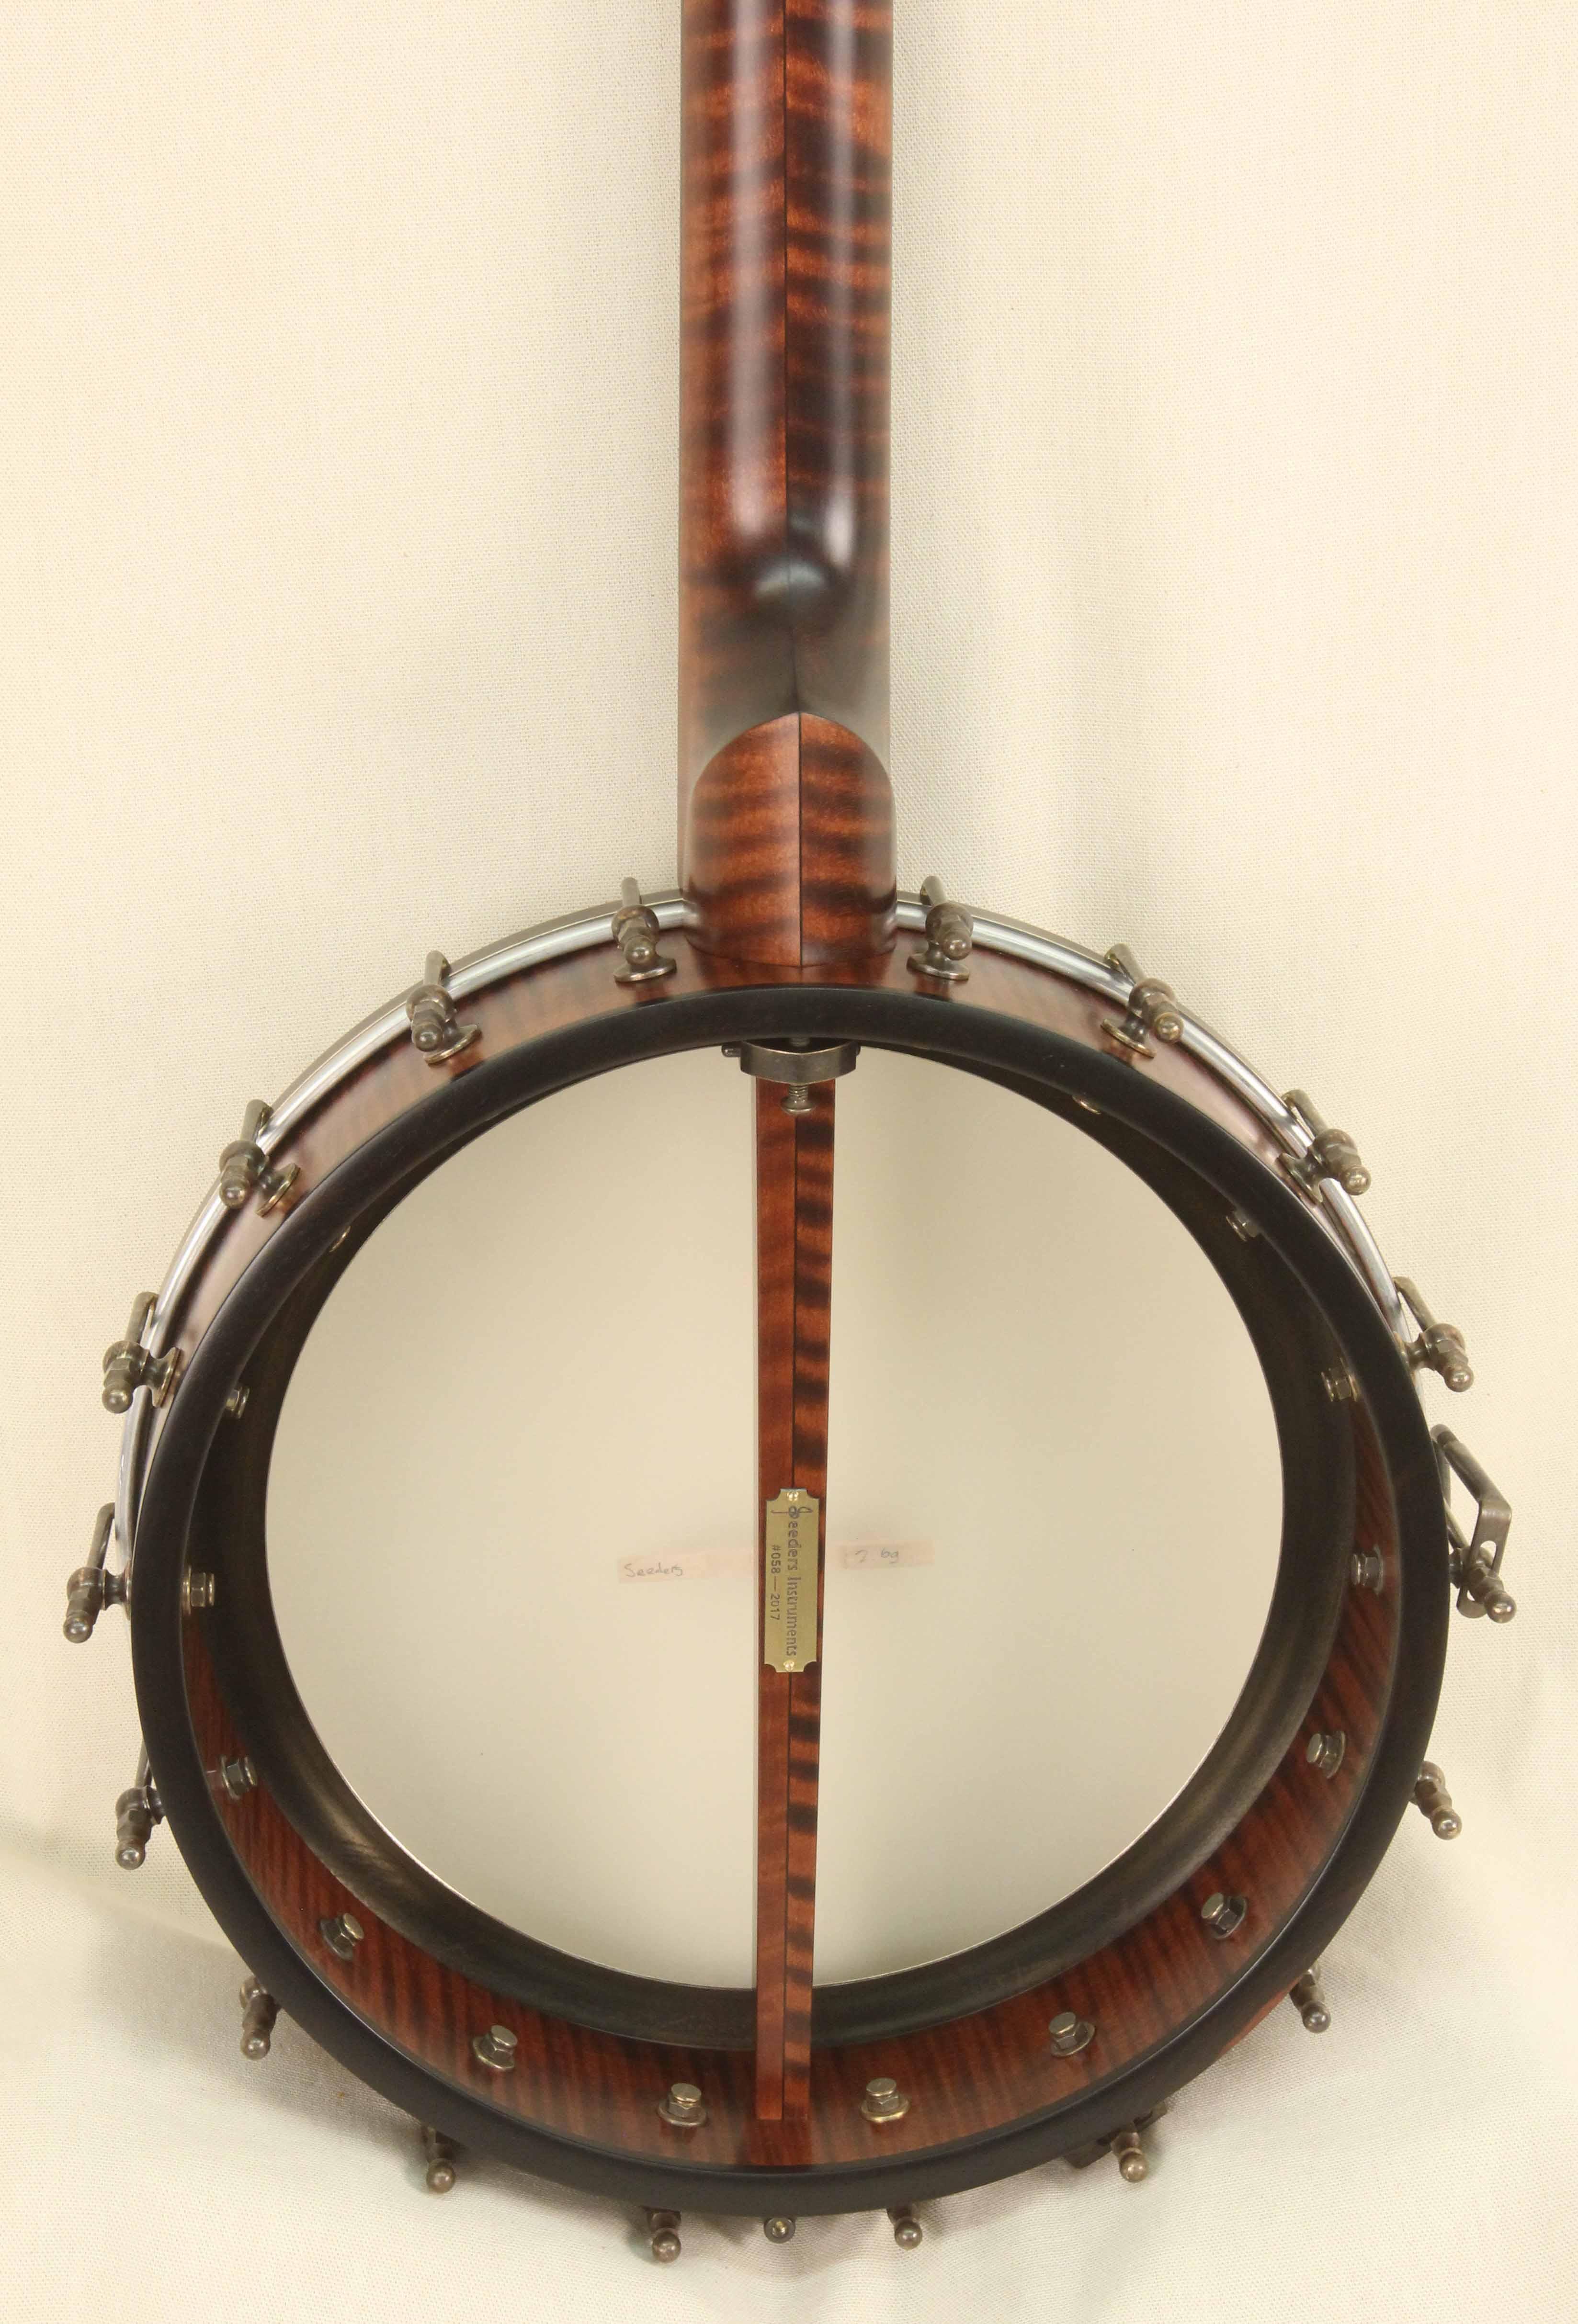 dobson banjo Archives - Seeders Instruments